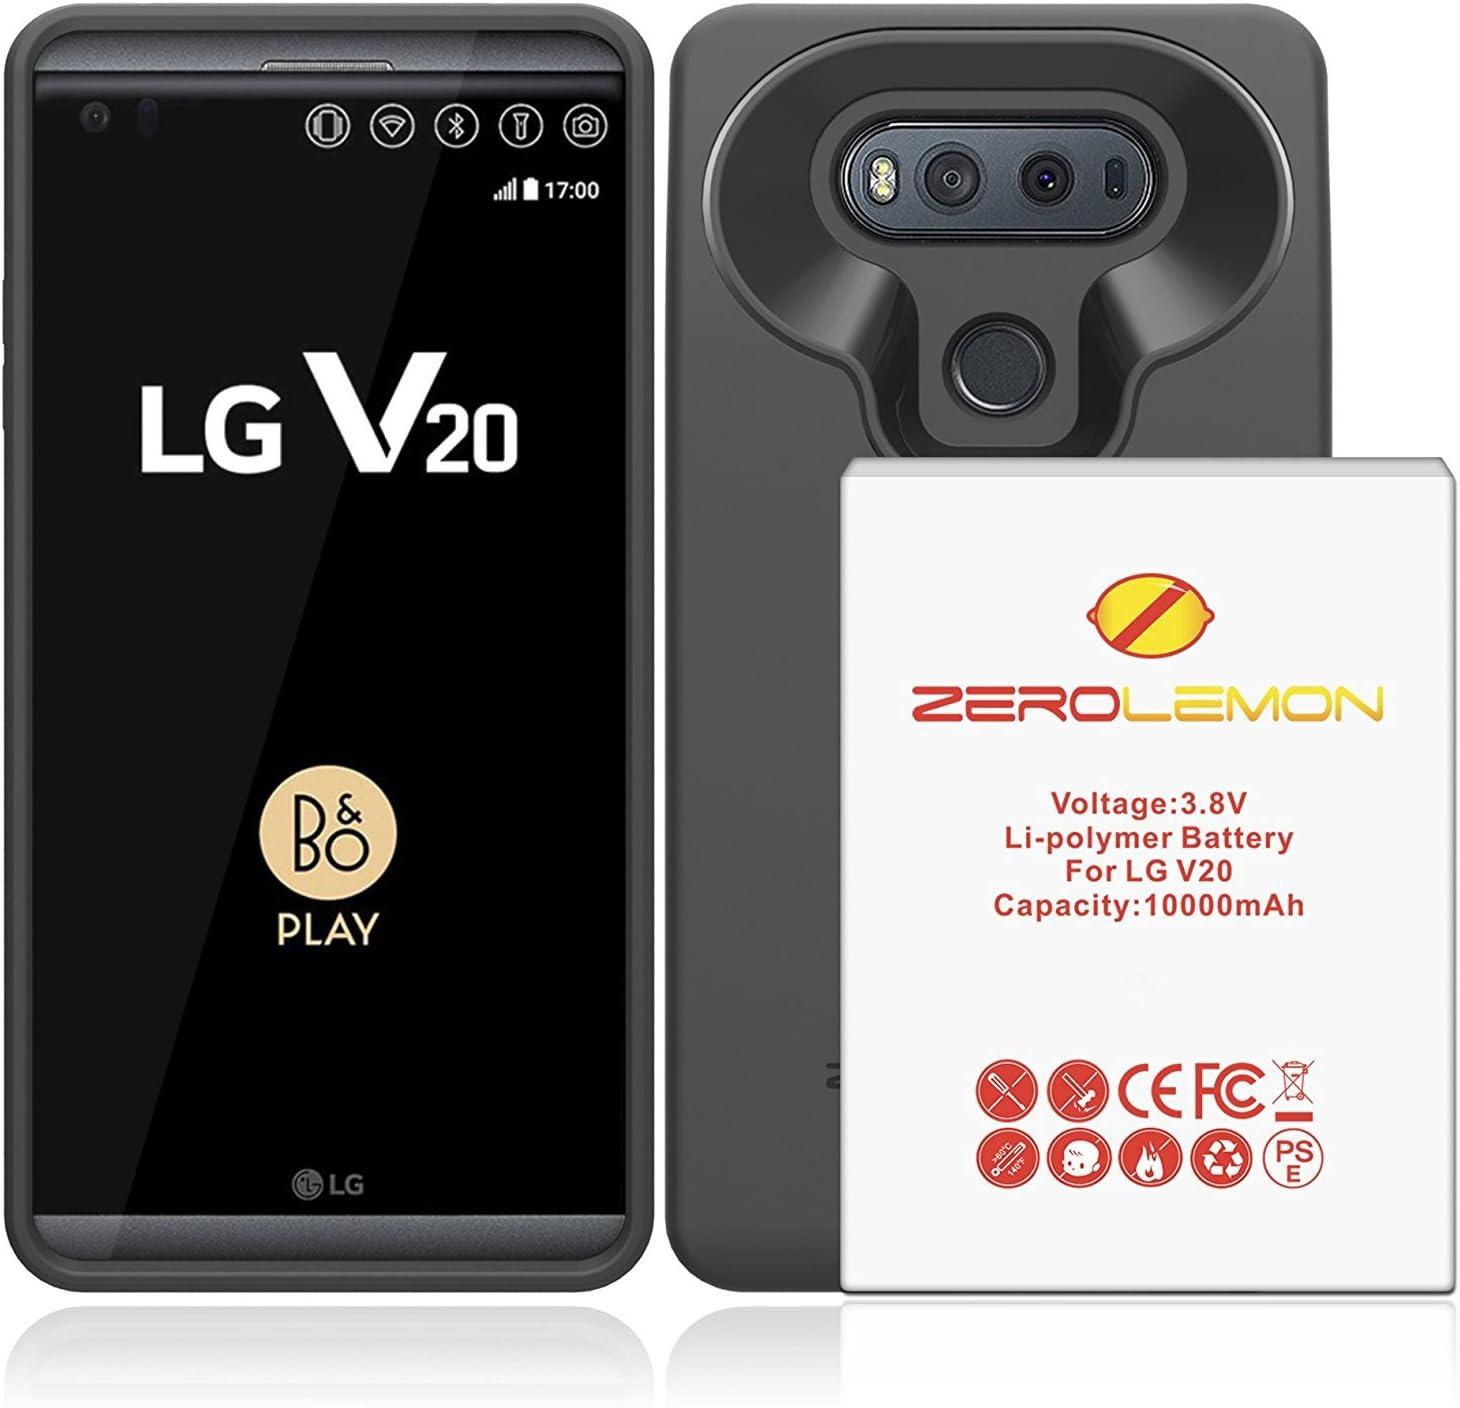 LG V20 Carcasa de batería, ZeroLemon LG V20 Tricell de 10000 mAh batería ampliada con Suave TPU Full Edge Funda de protección – Negro: Amazon.es: Electrónica